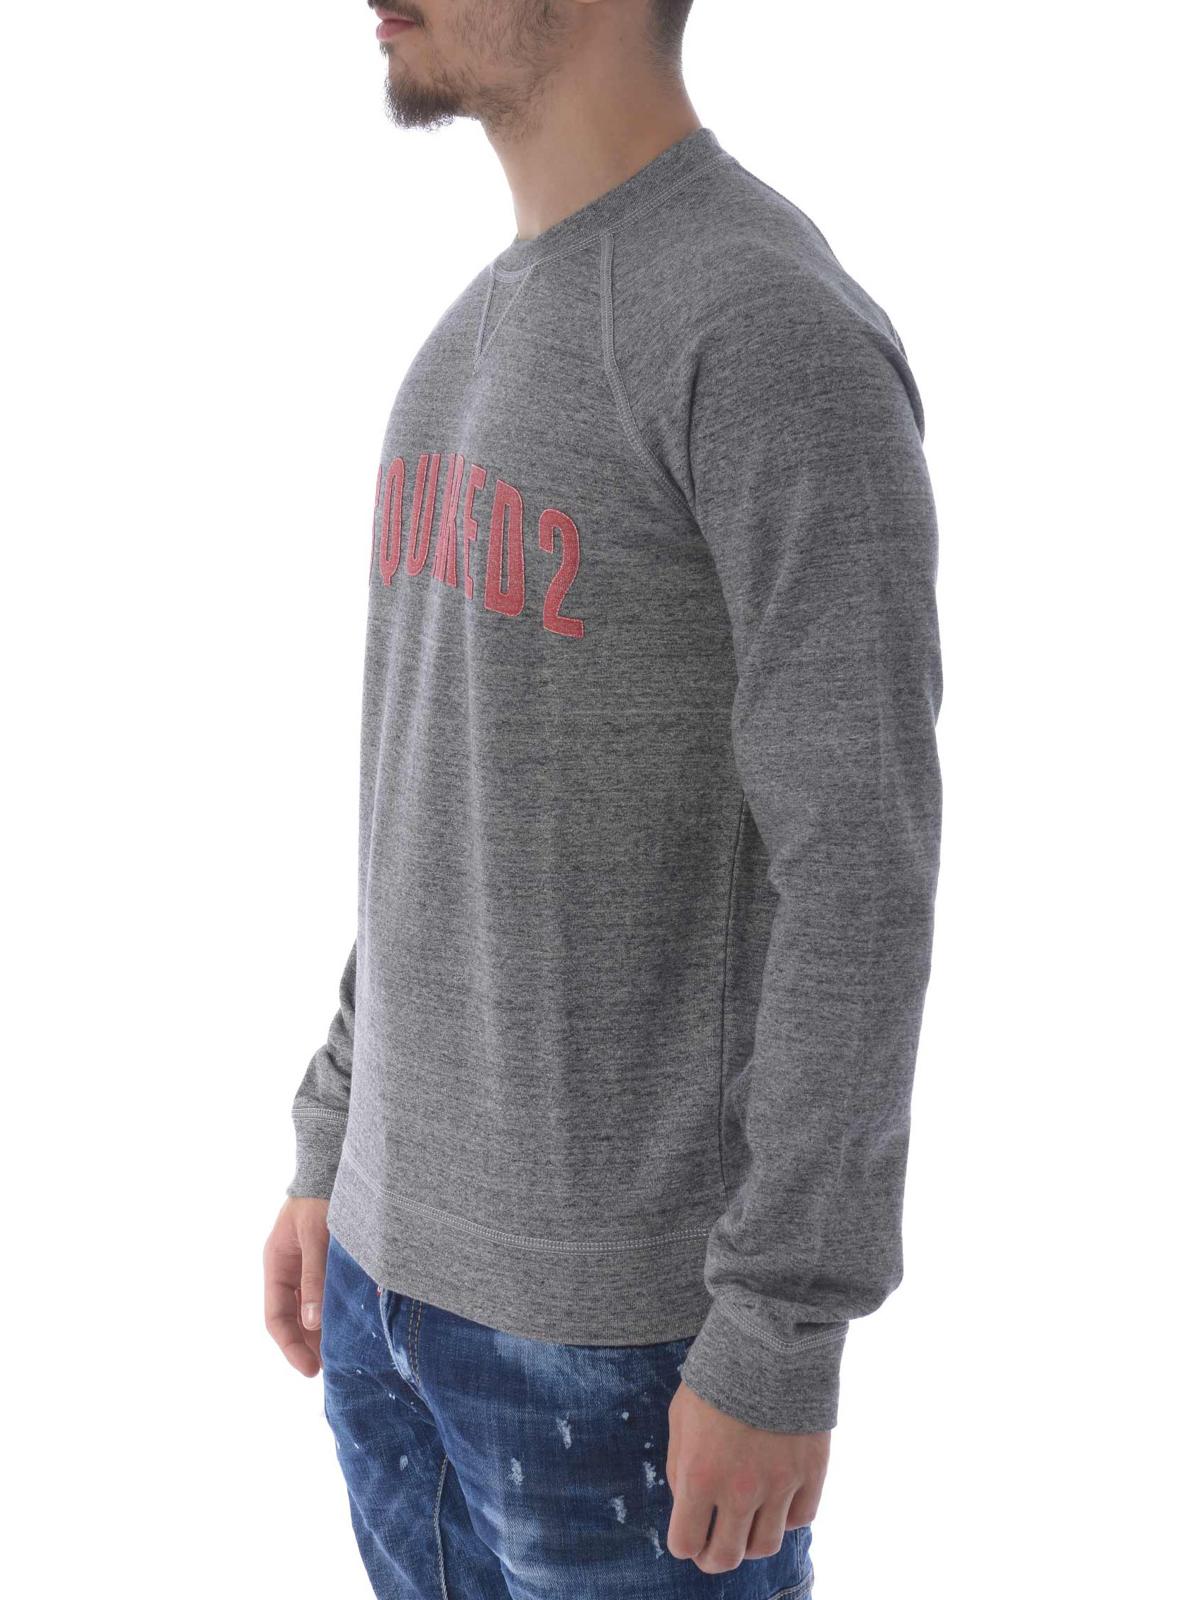 D2 Logo lettering cotton sweatshirt by Dsquared2 - Sweatshirts ...